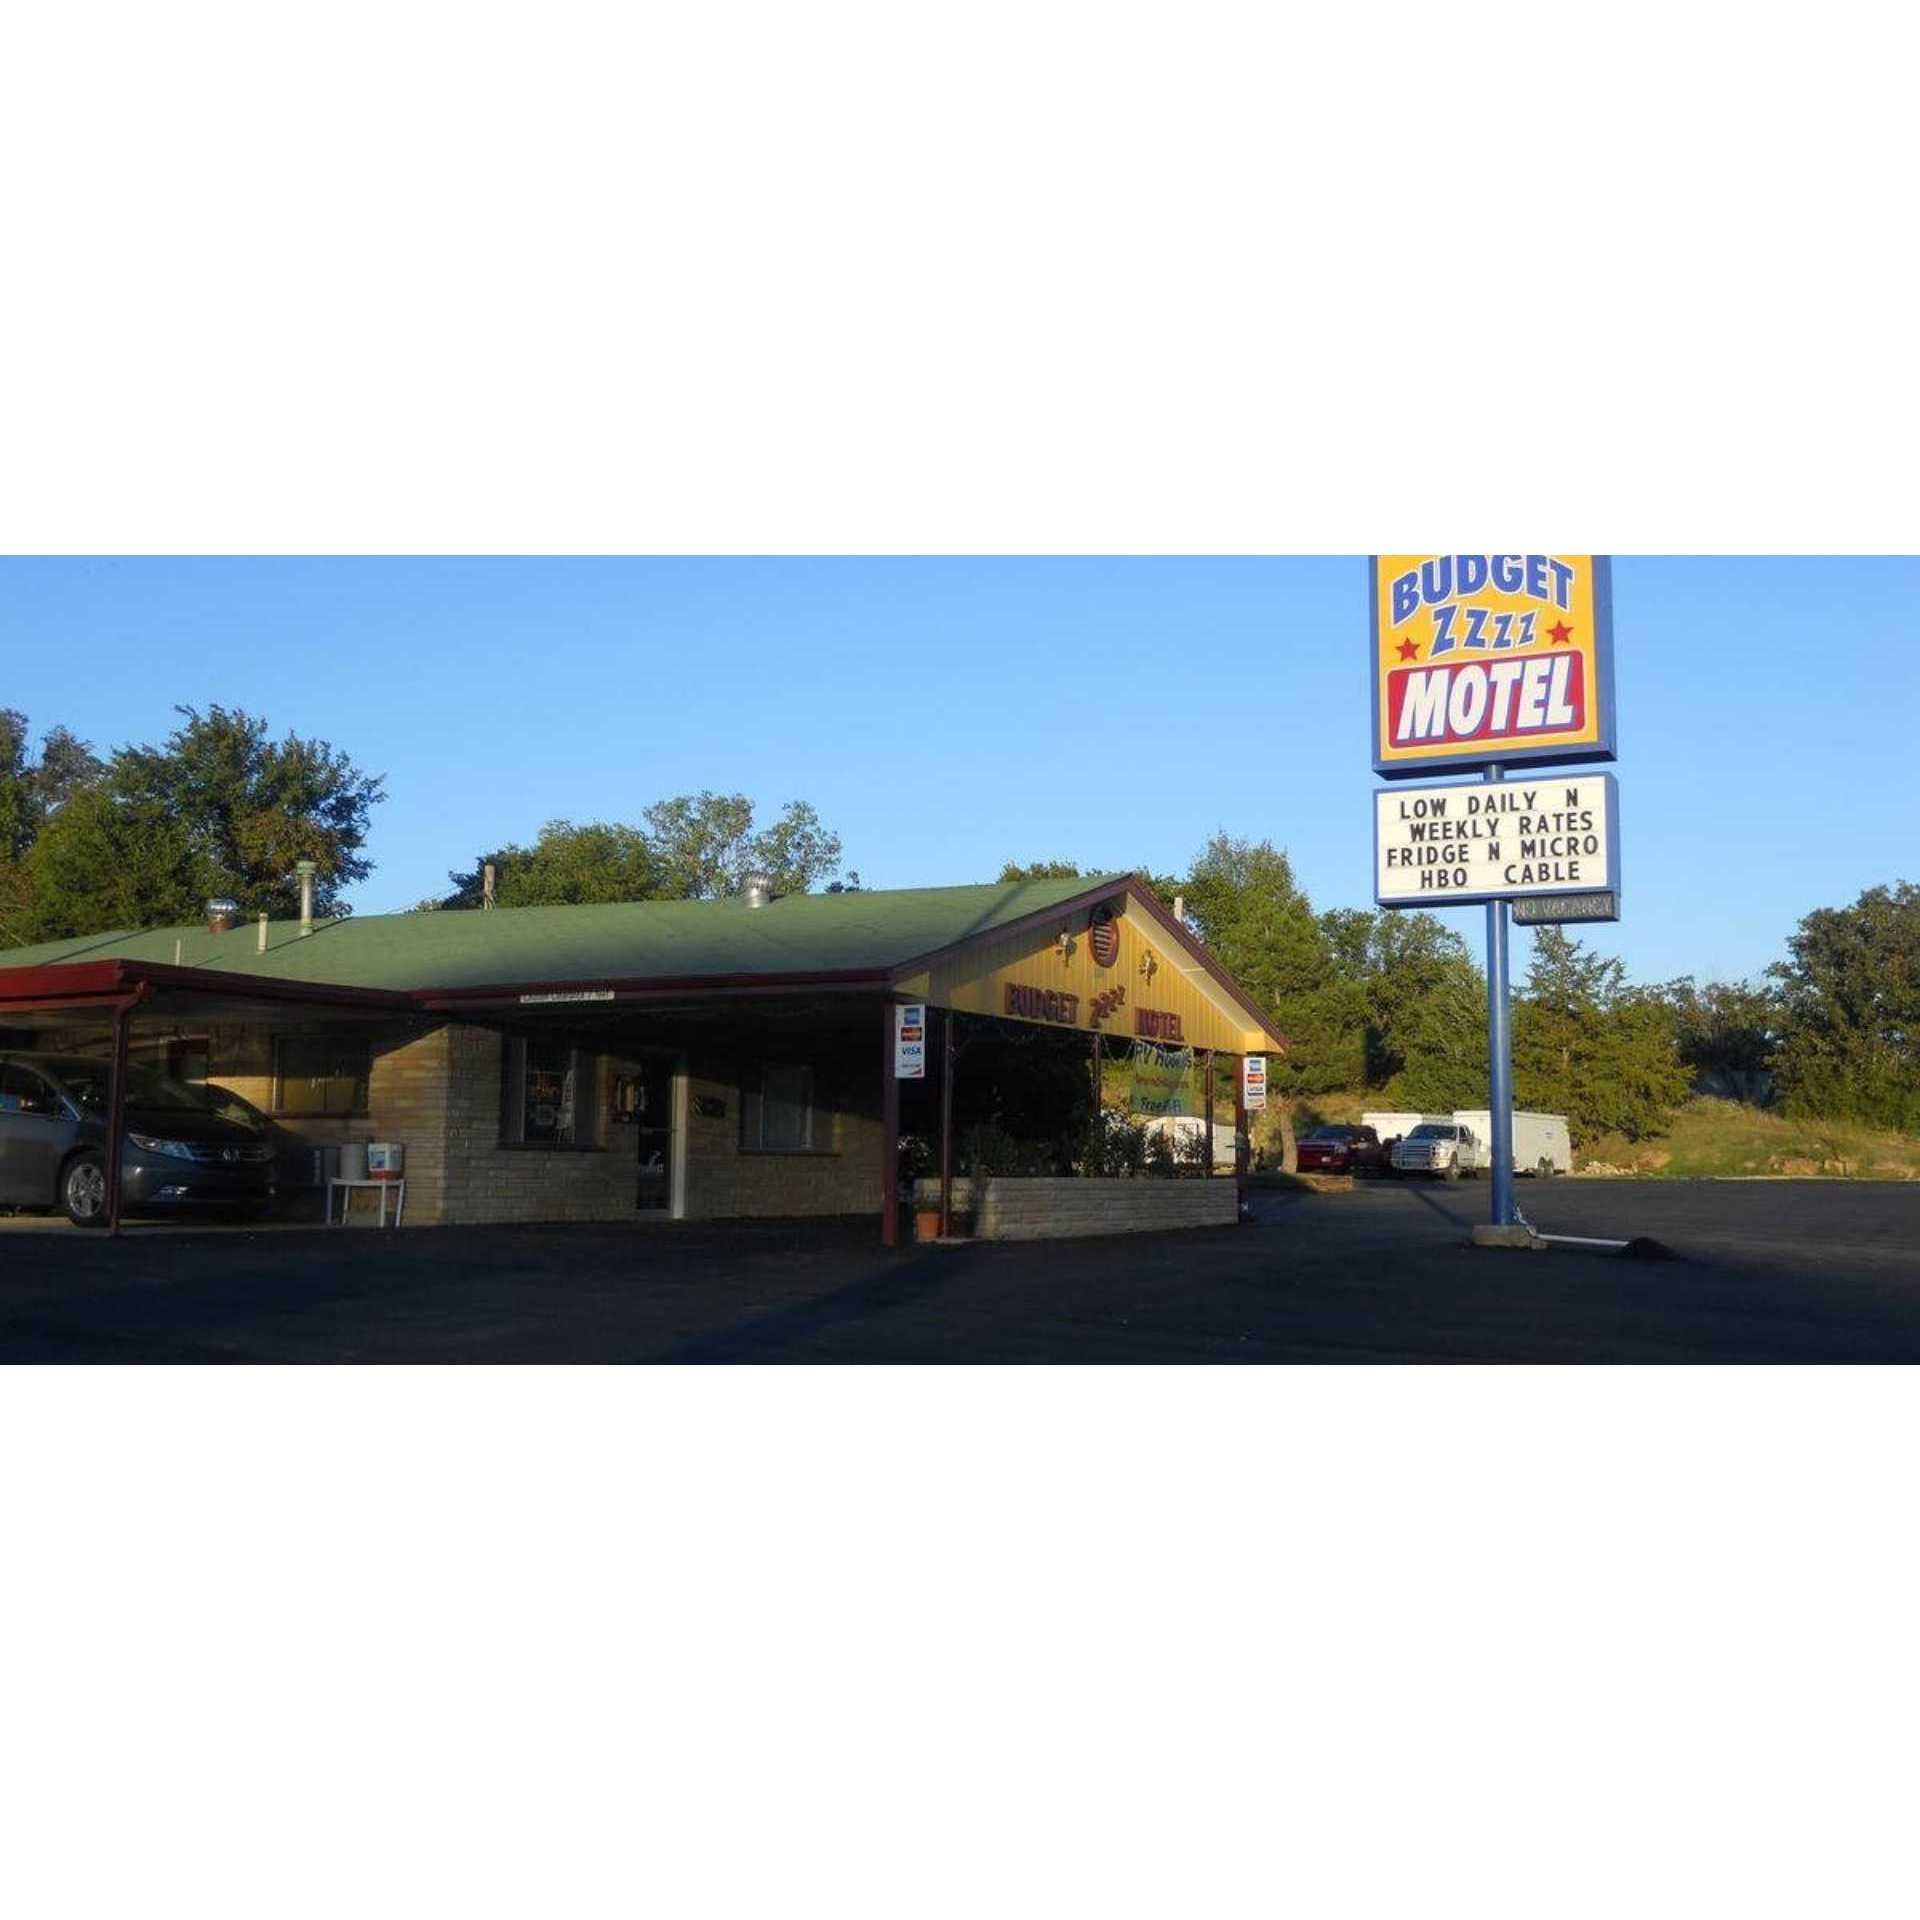 Budget ZZZZ Motel - Cleveland, OK - Hotels & Motels